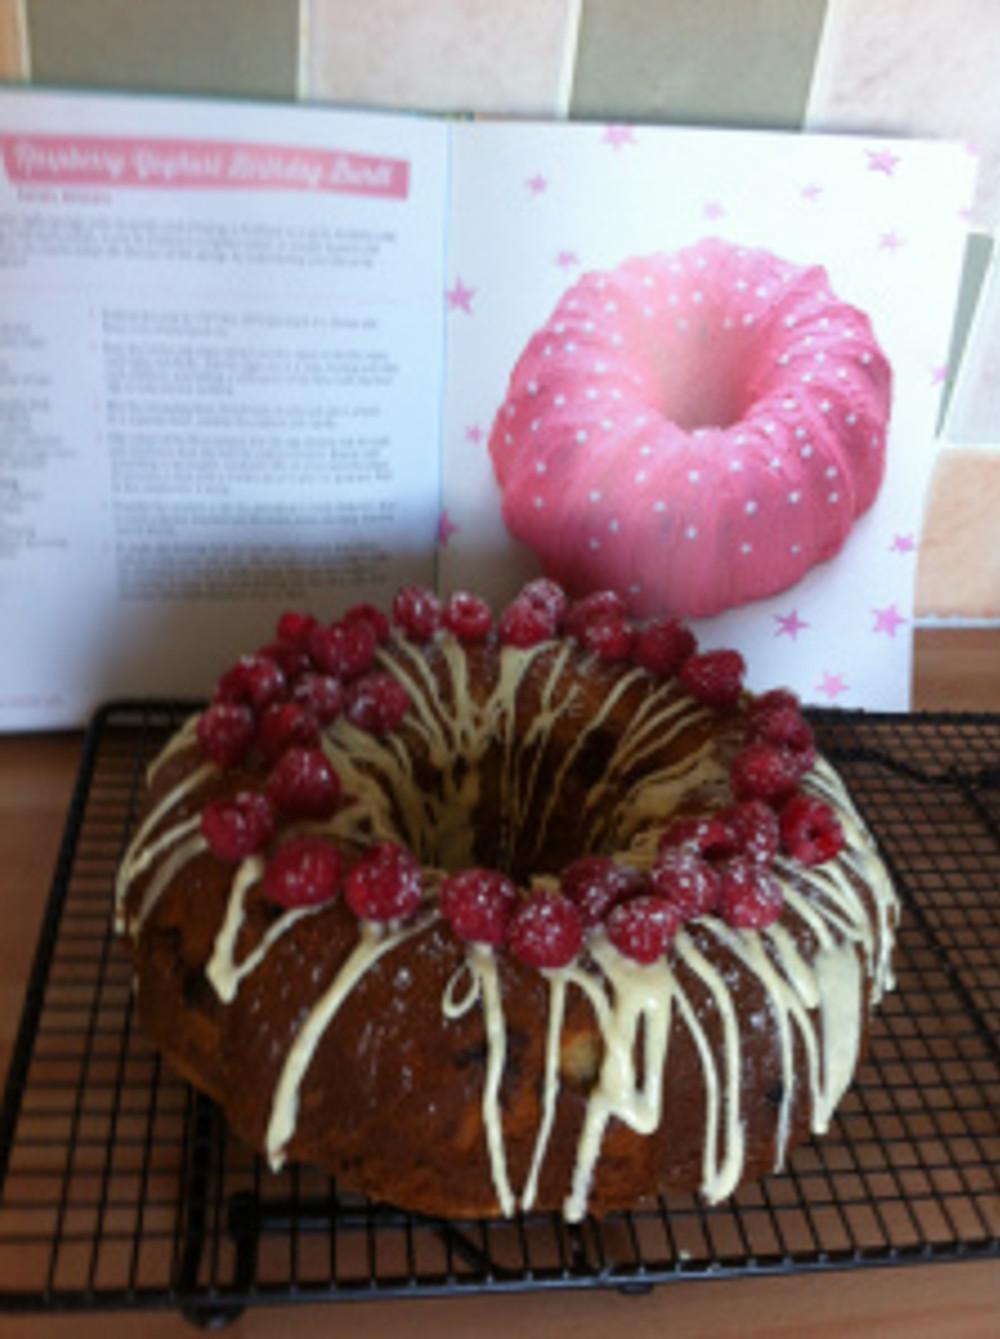 My version of Rachel McGrath's stunning Raspberry Yoghurt Bundt cake with her original recipe pictured behind!